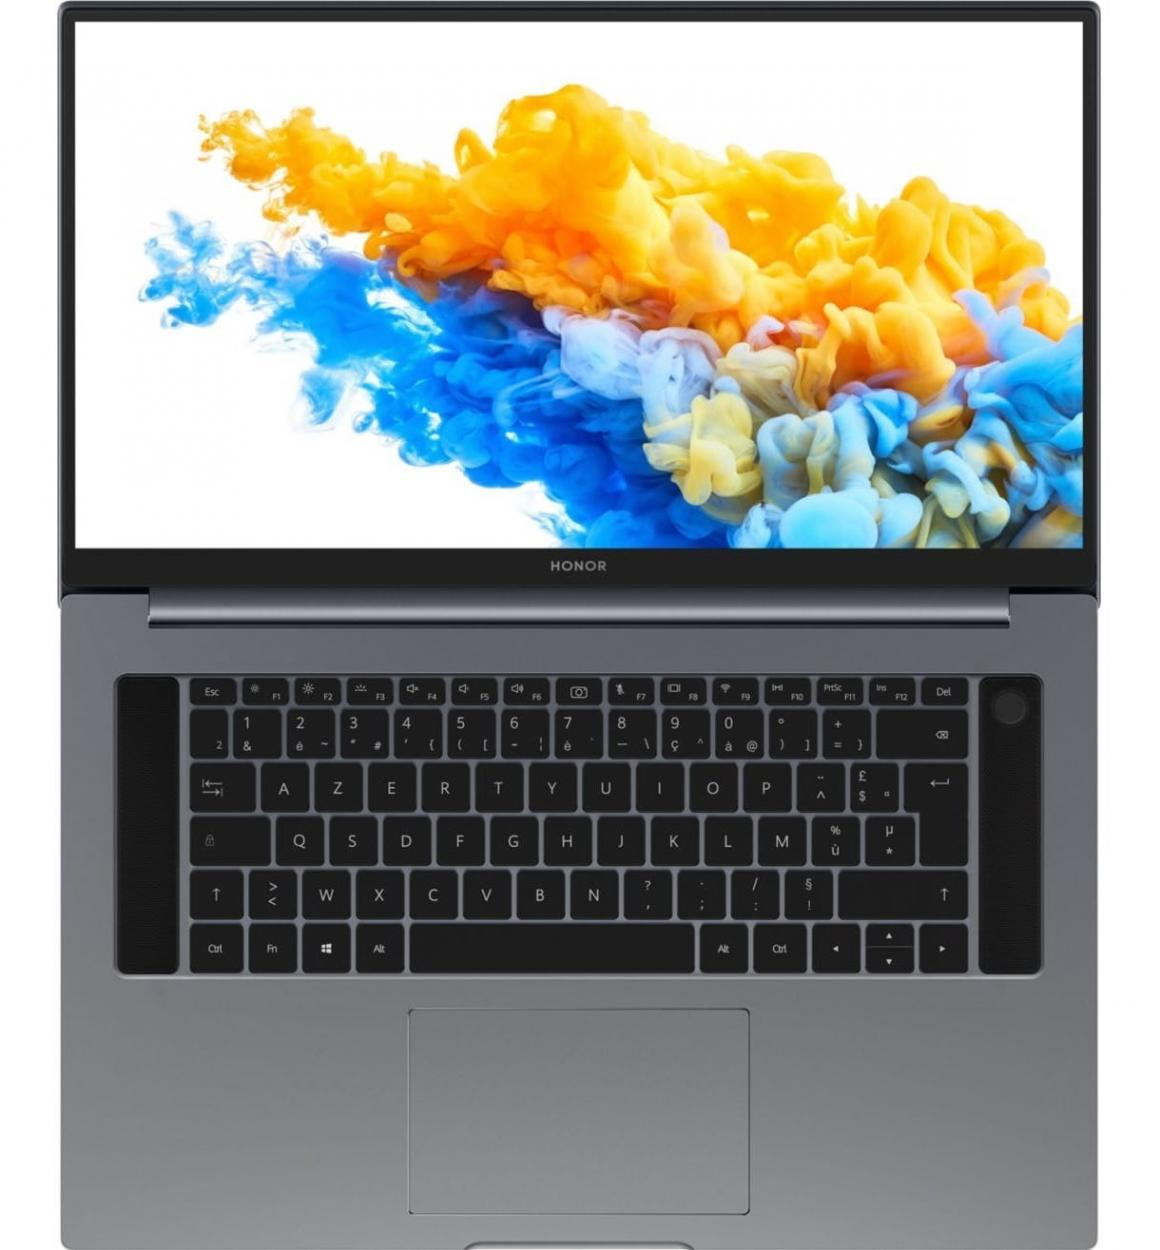 Ordinateur portable Honor MagicBook Pro 16 2020 - Ryzen 5 - photo 3